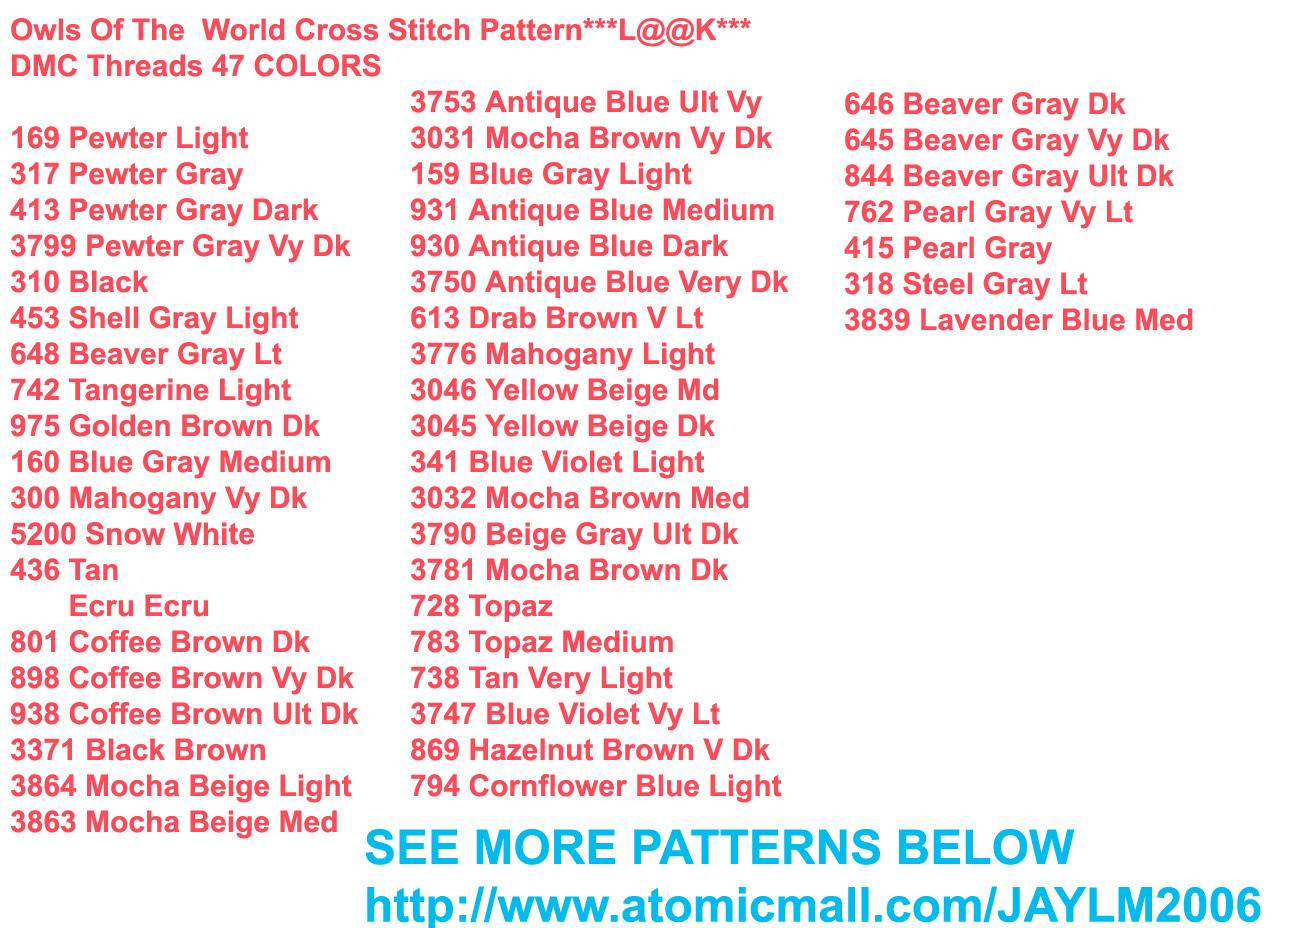 Owls Of The  World Cross Stitch Pattern***LOOK***